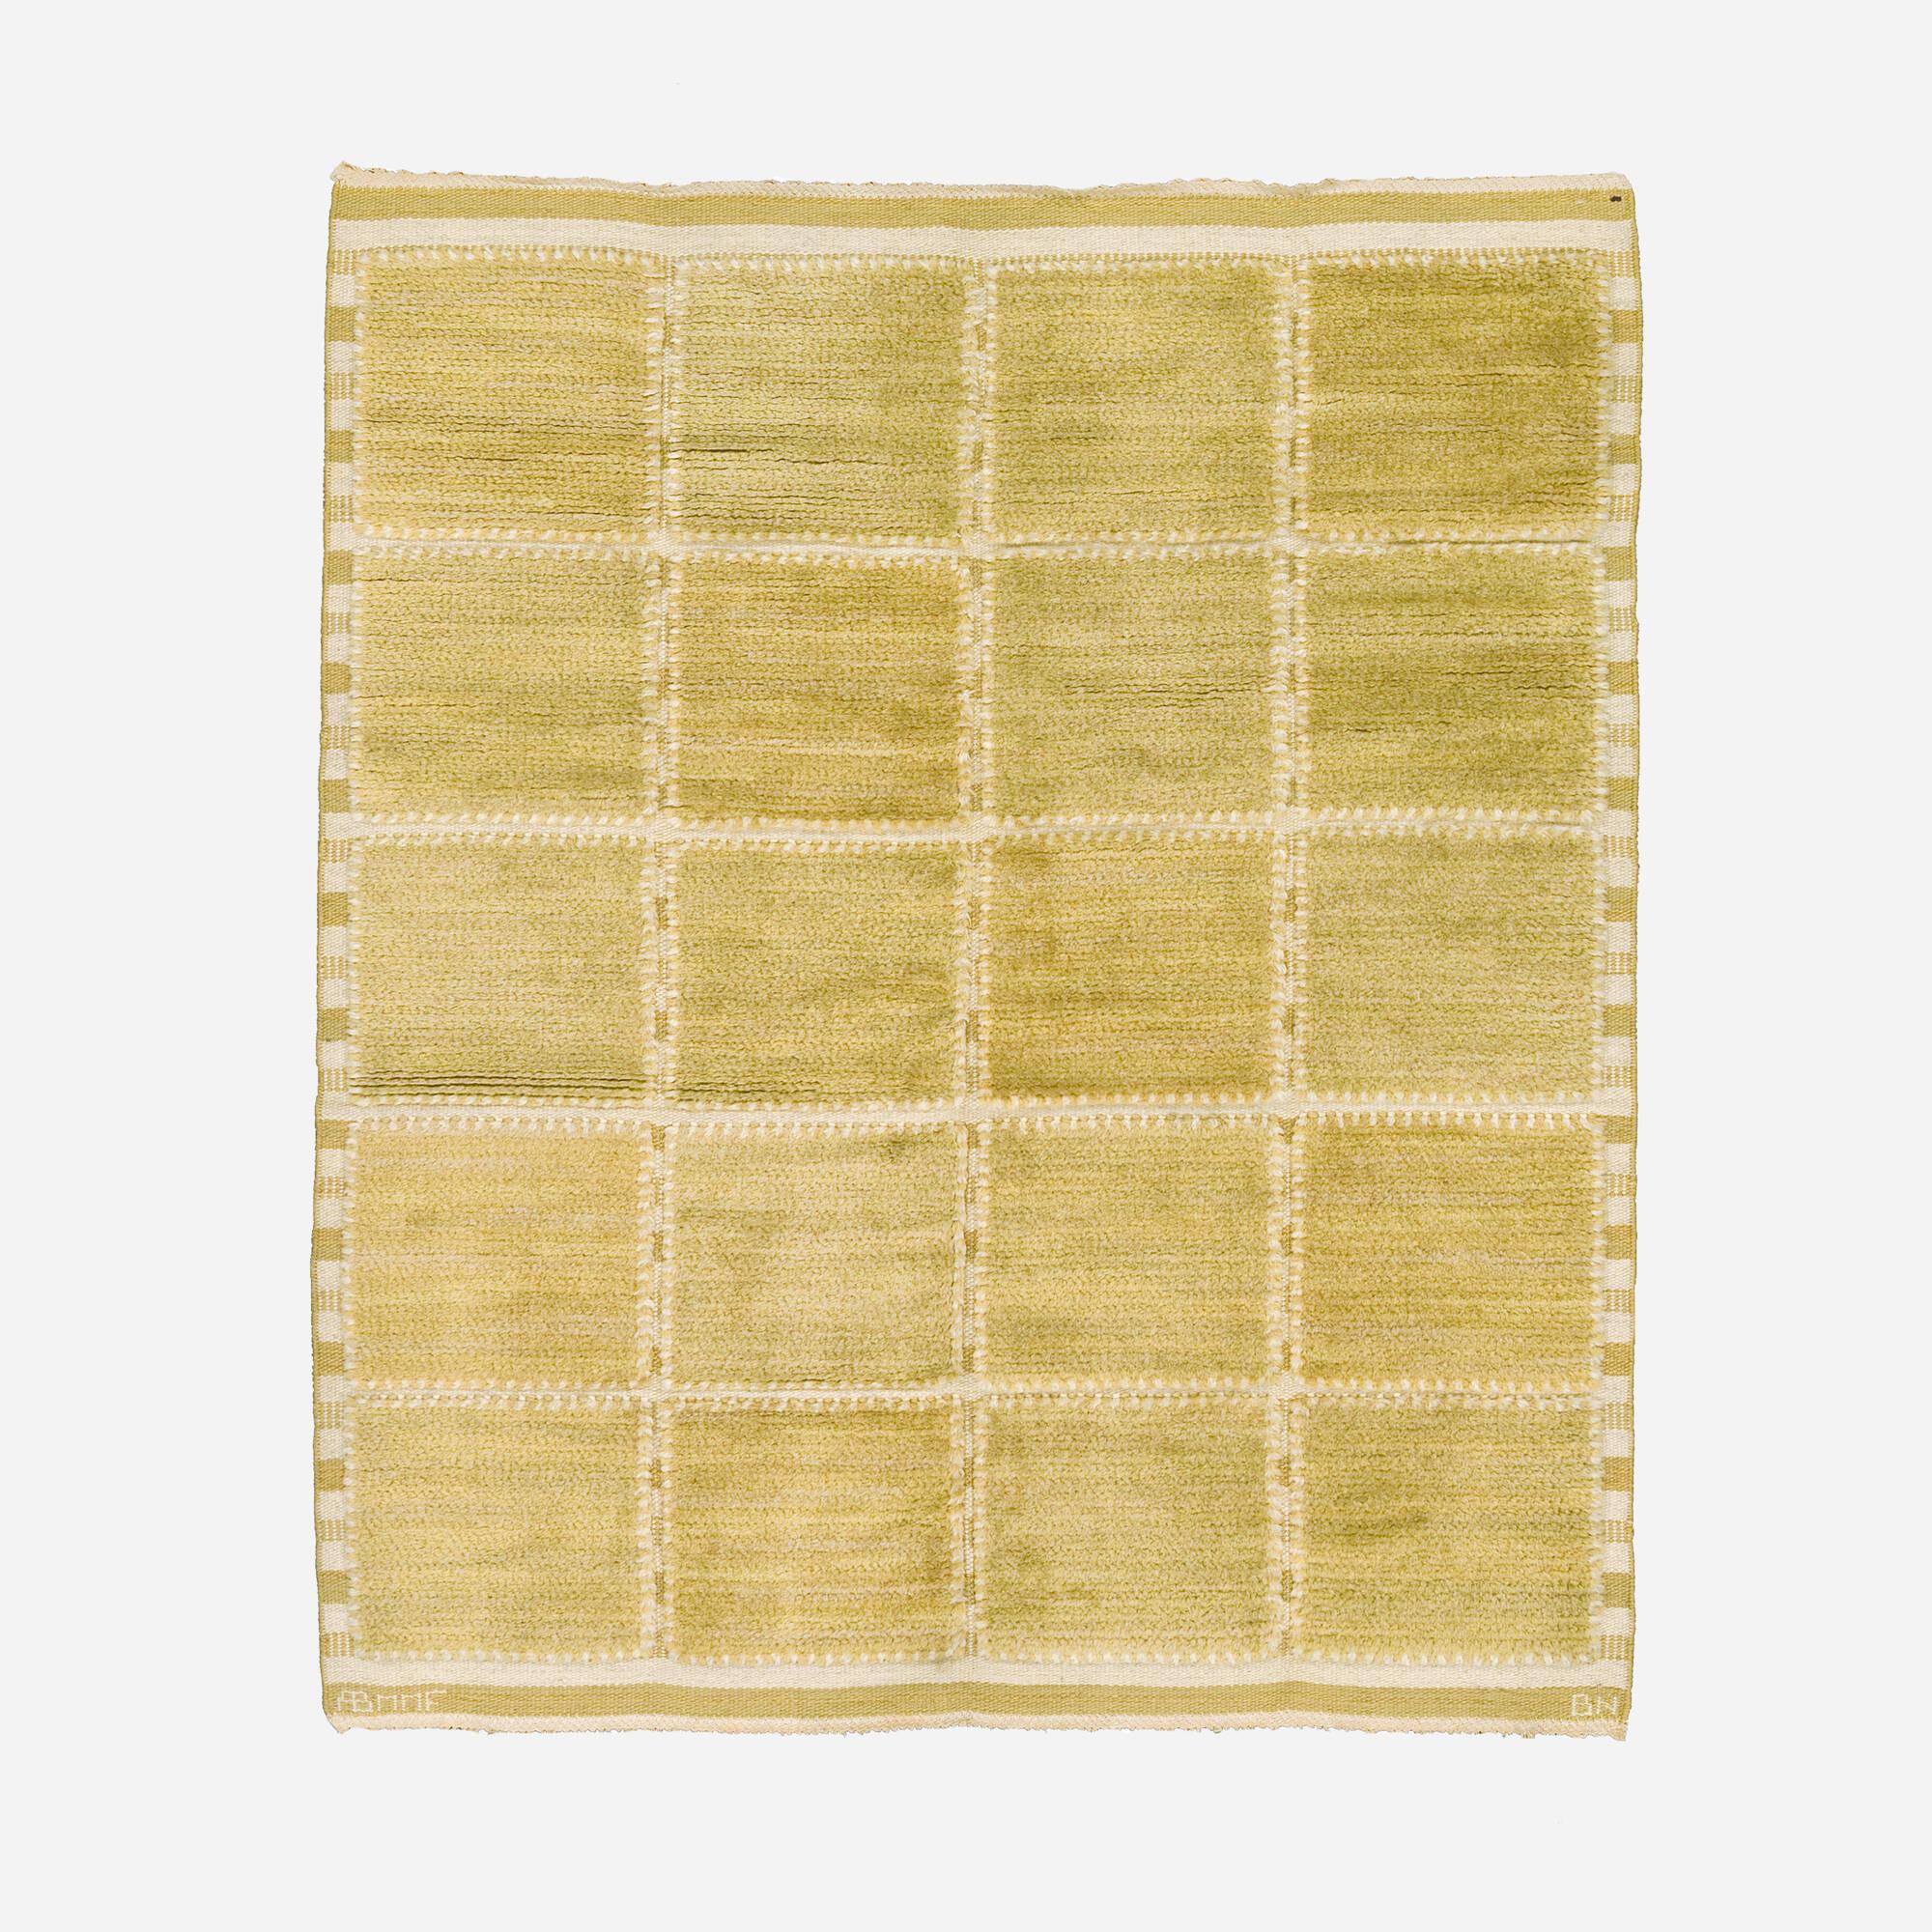 124: Barbro Nilsson / Gyllenrutan half-pile carpet (1 of 1)